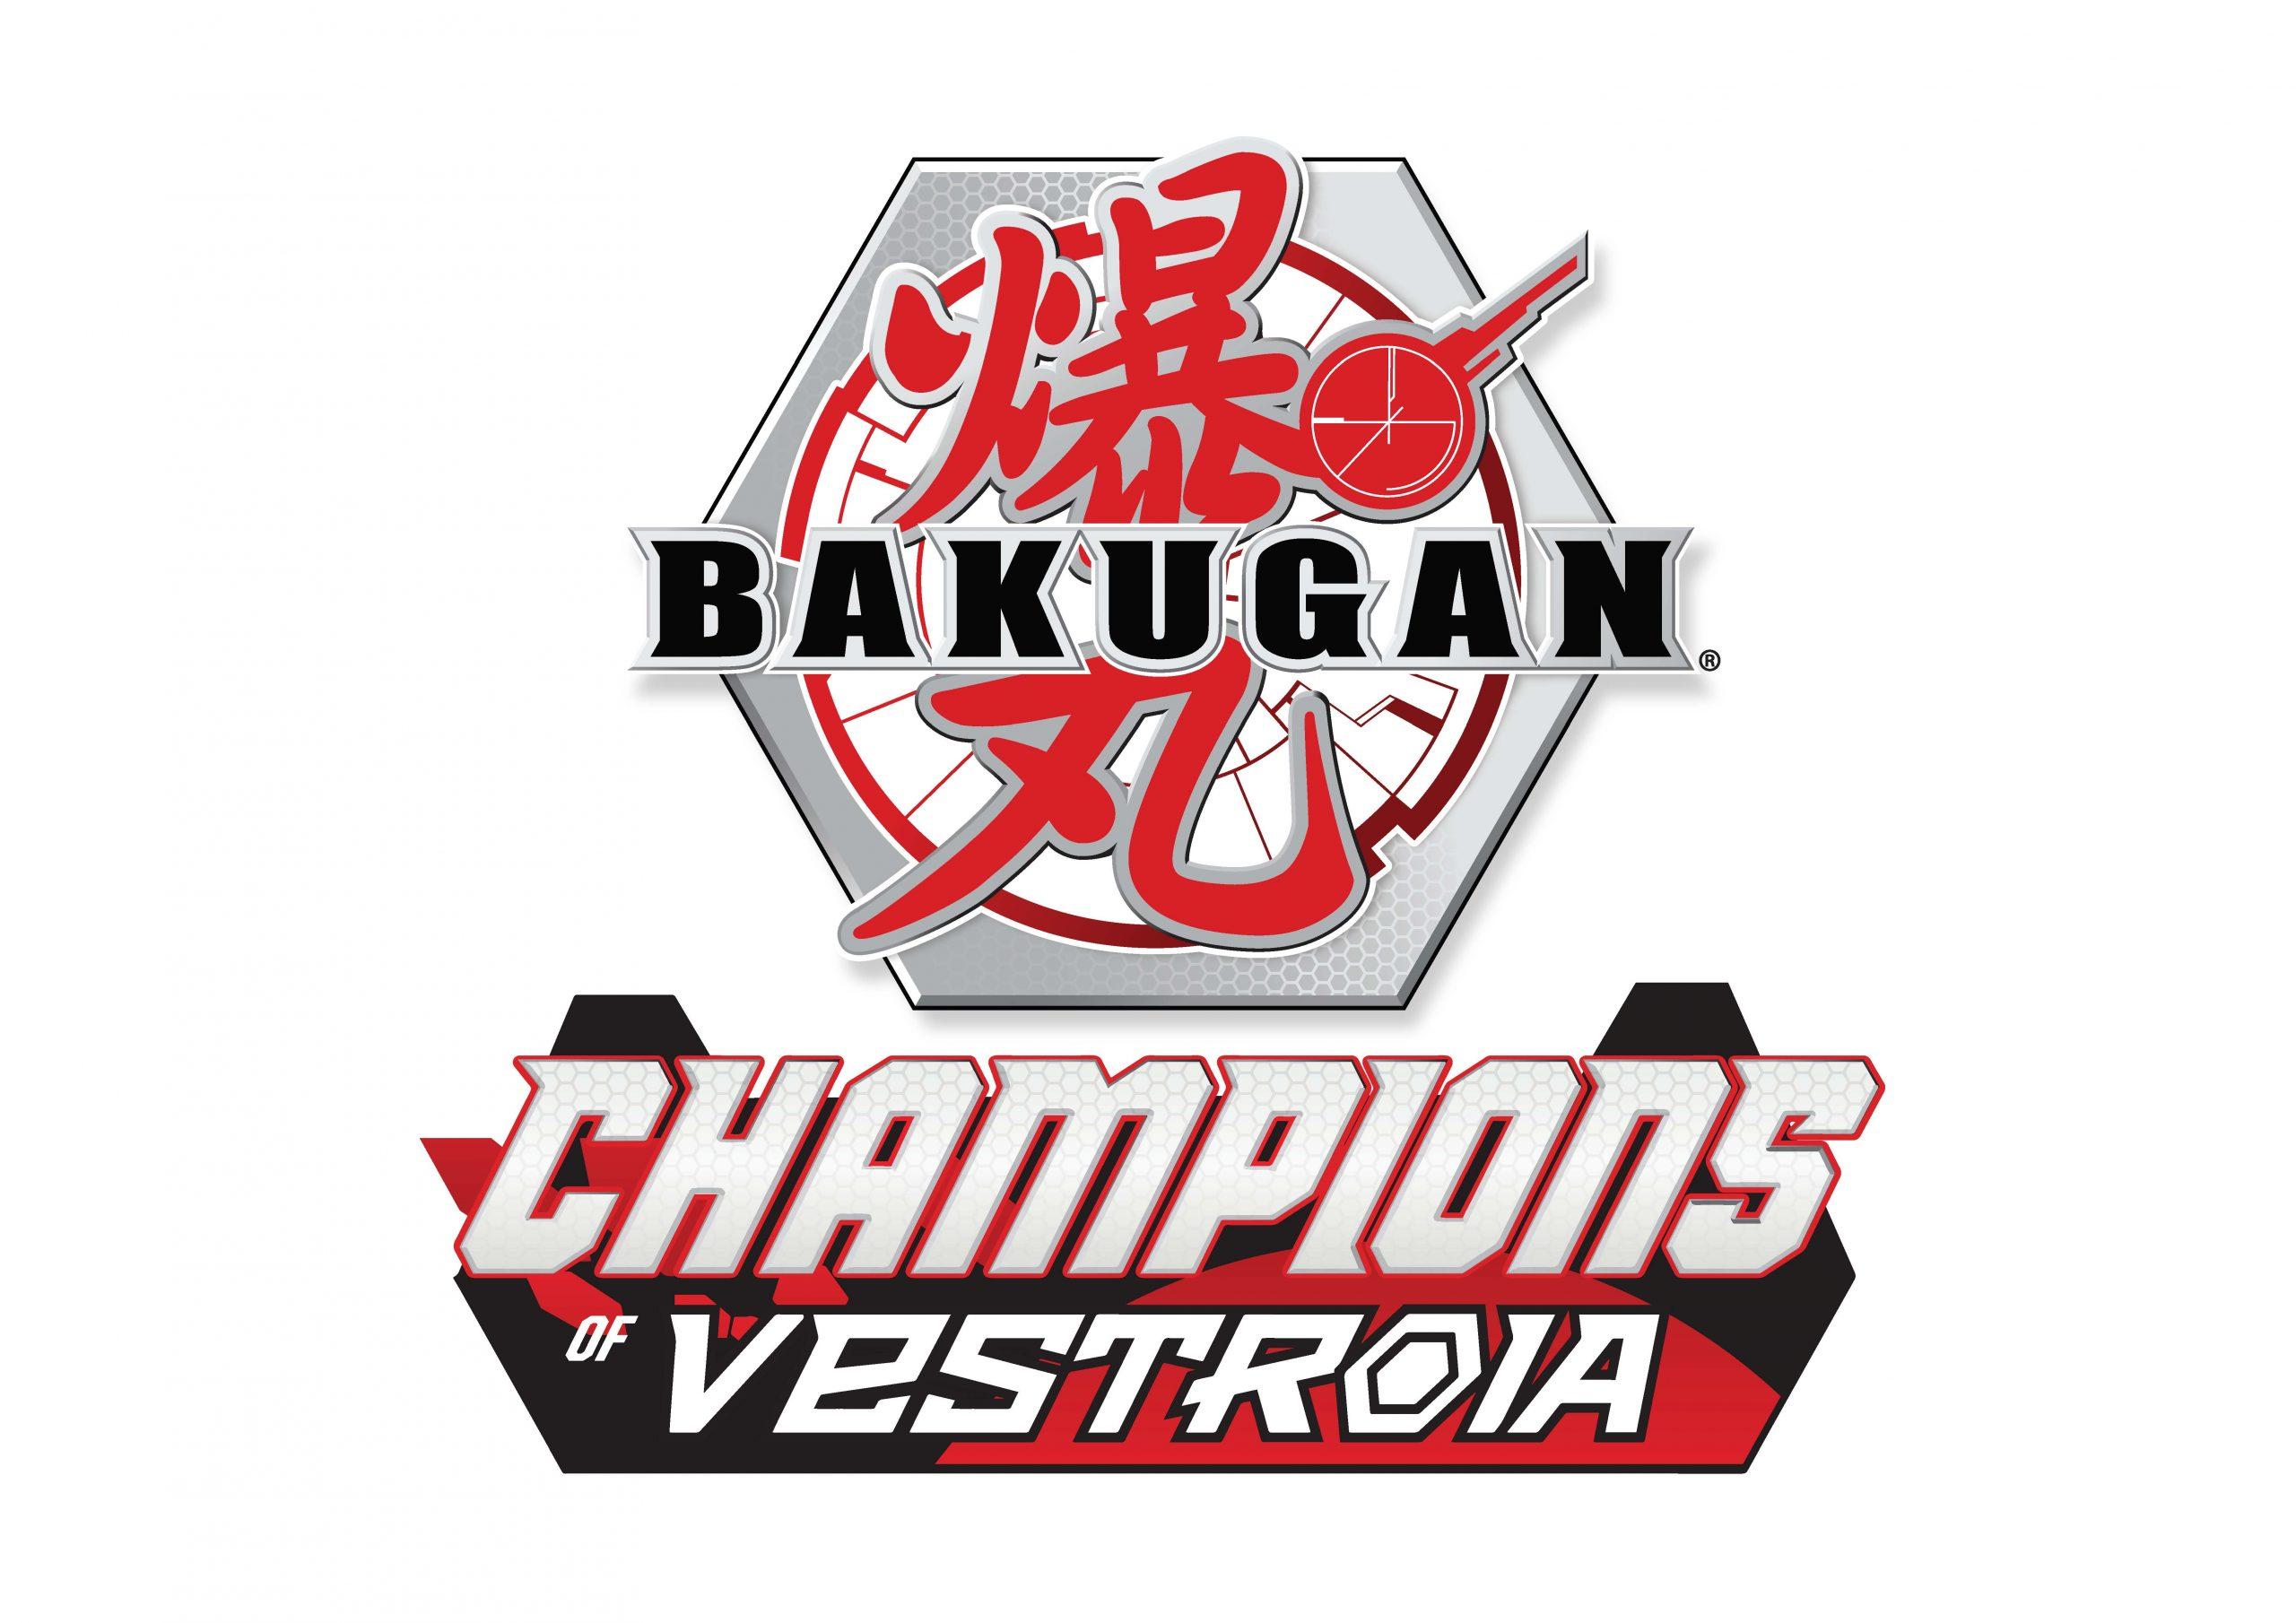 Bakugan: Champions of Vestroia logo